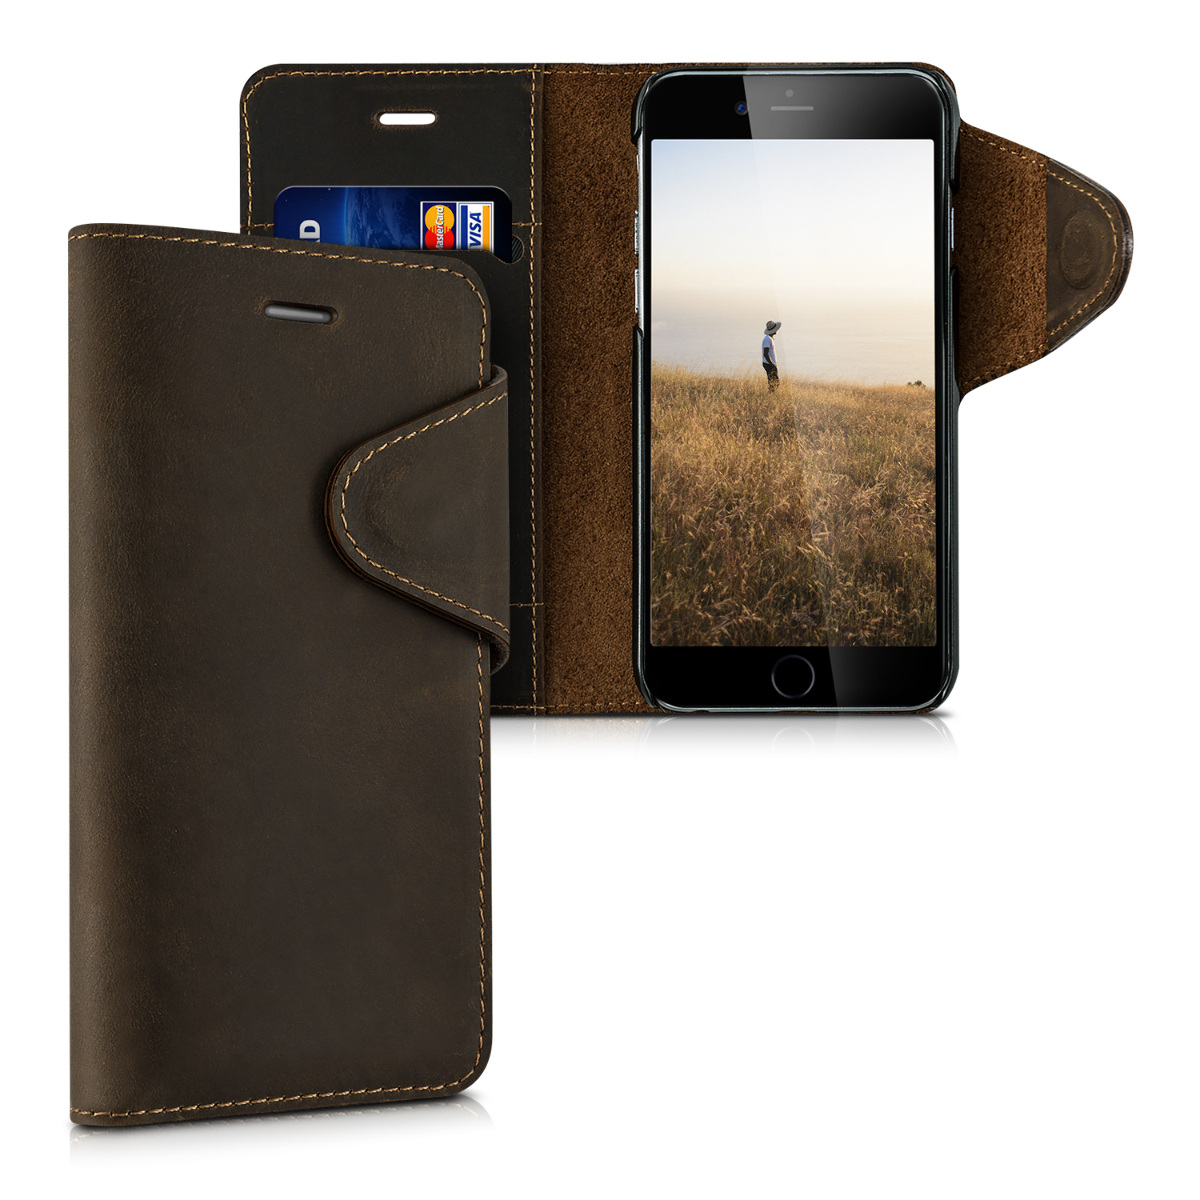 Kalibri Δερμάτινη Suede Θήκη - Πορτοφόλι iPhone 6 / 6S - Brown (38793.05)